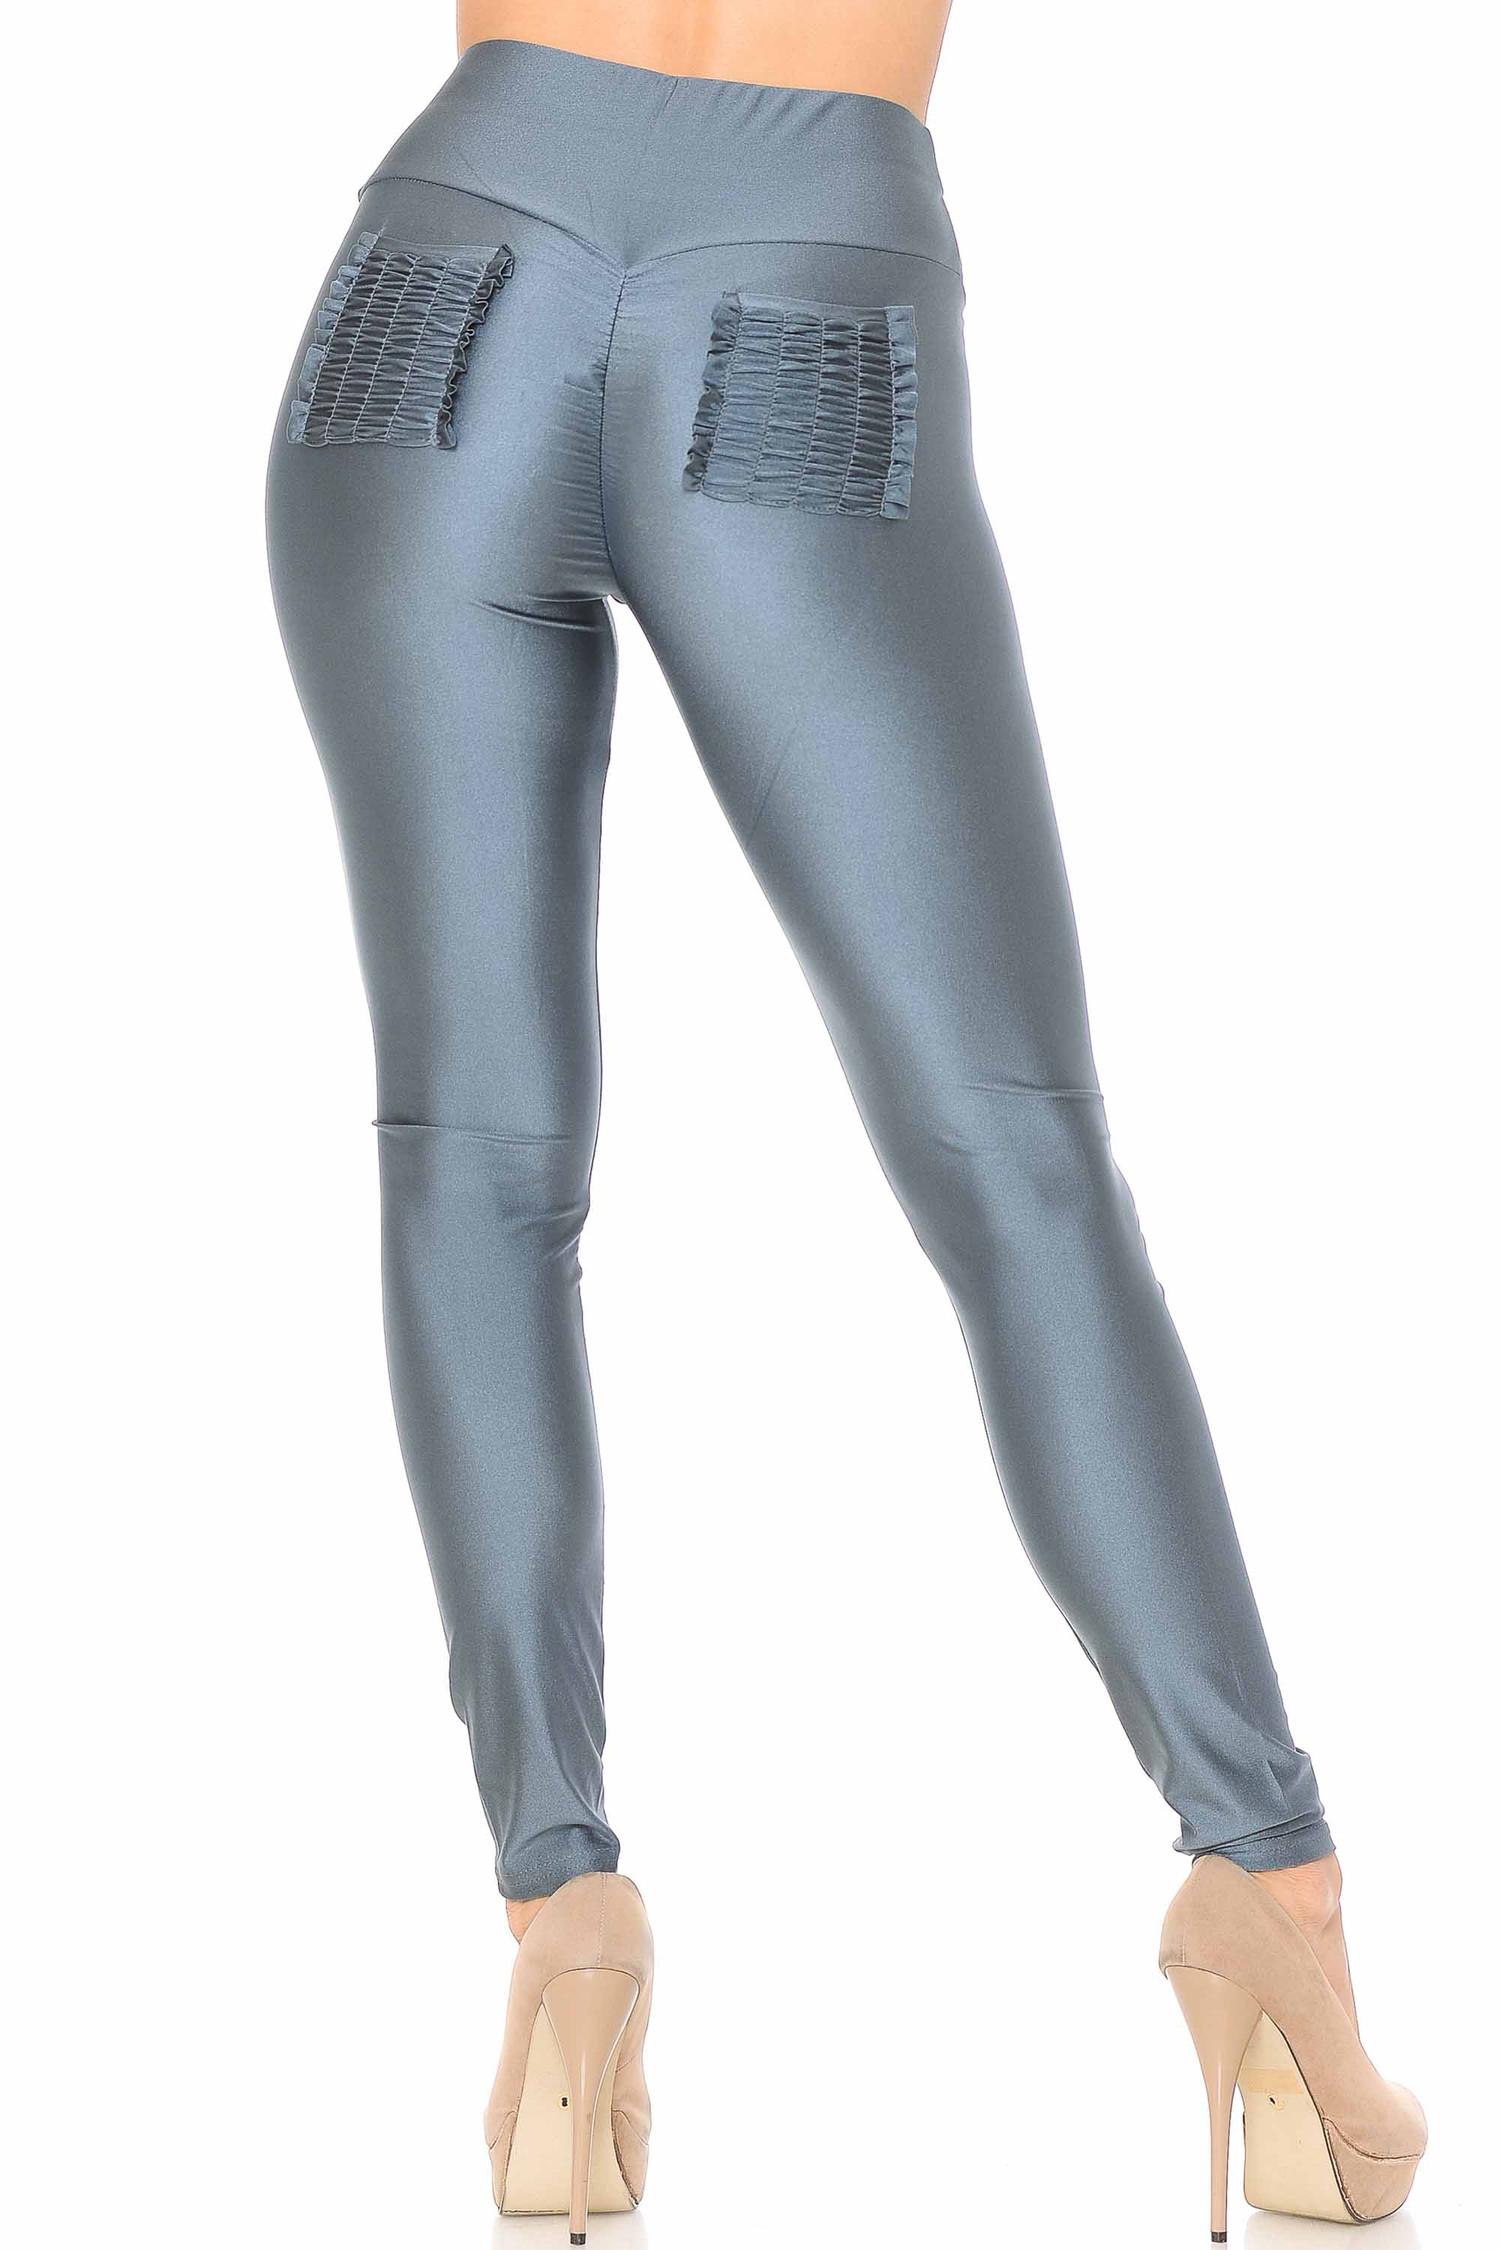 Furled Pocket Scrunch Butt High Waisted Leggings